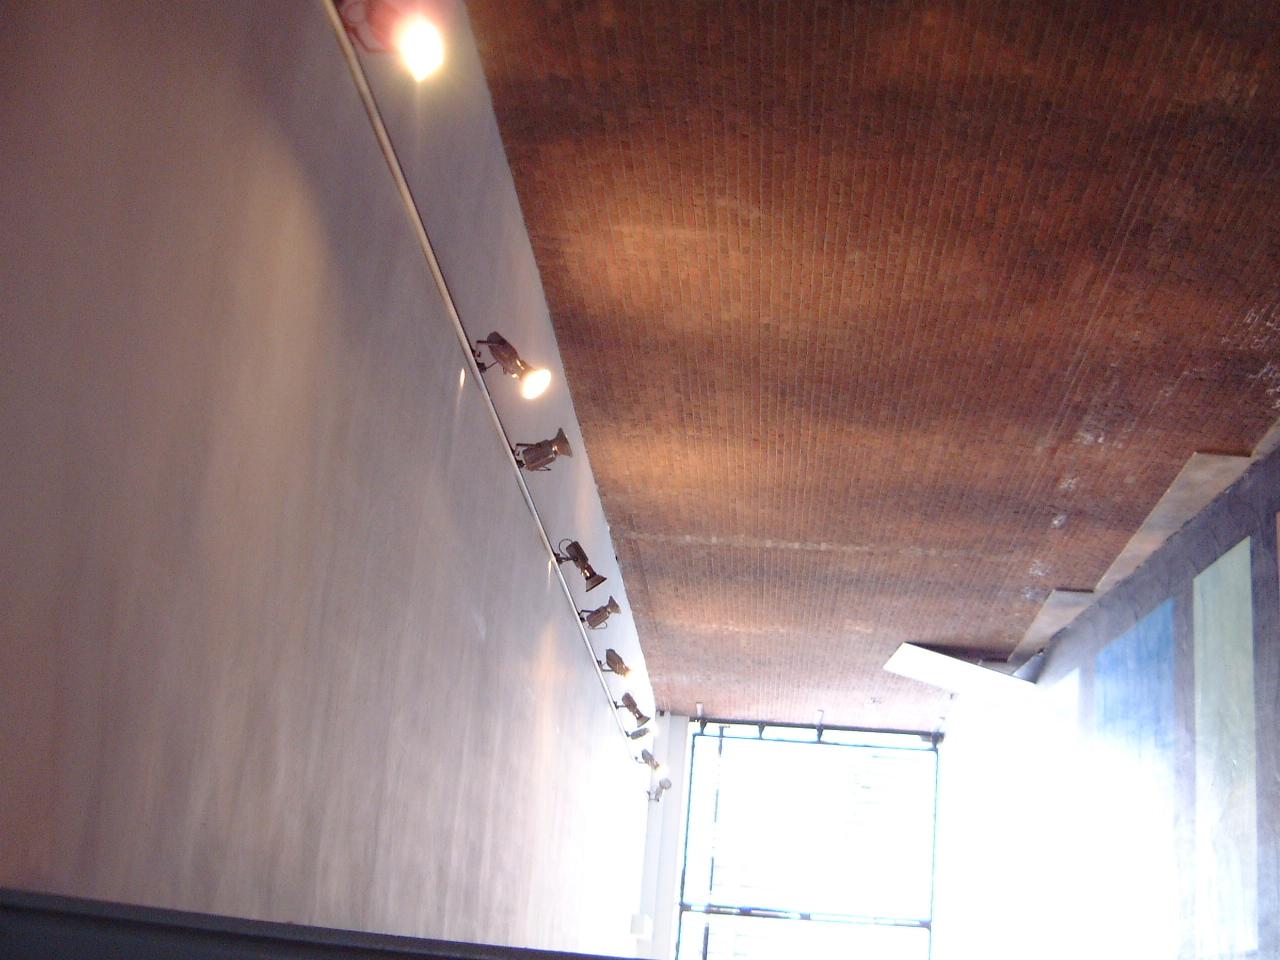 maartent lights spots shining on wall fixtures